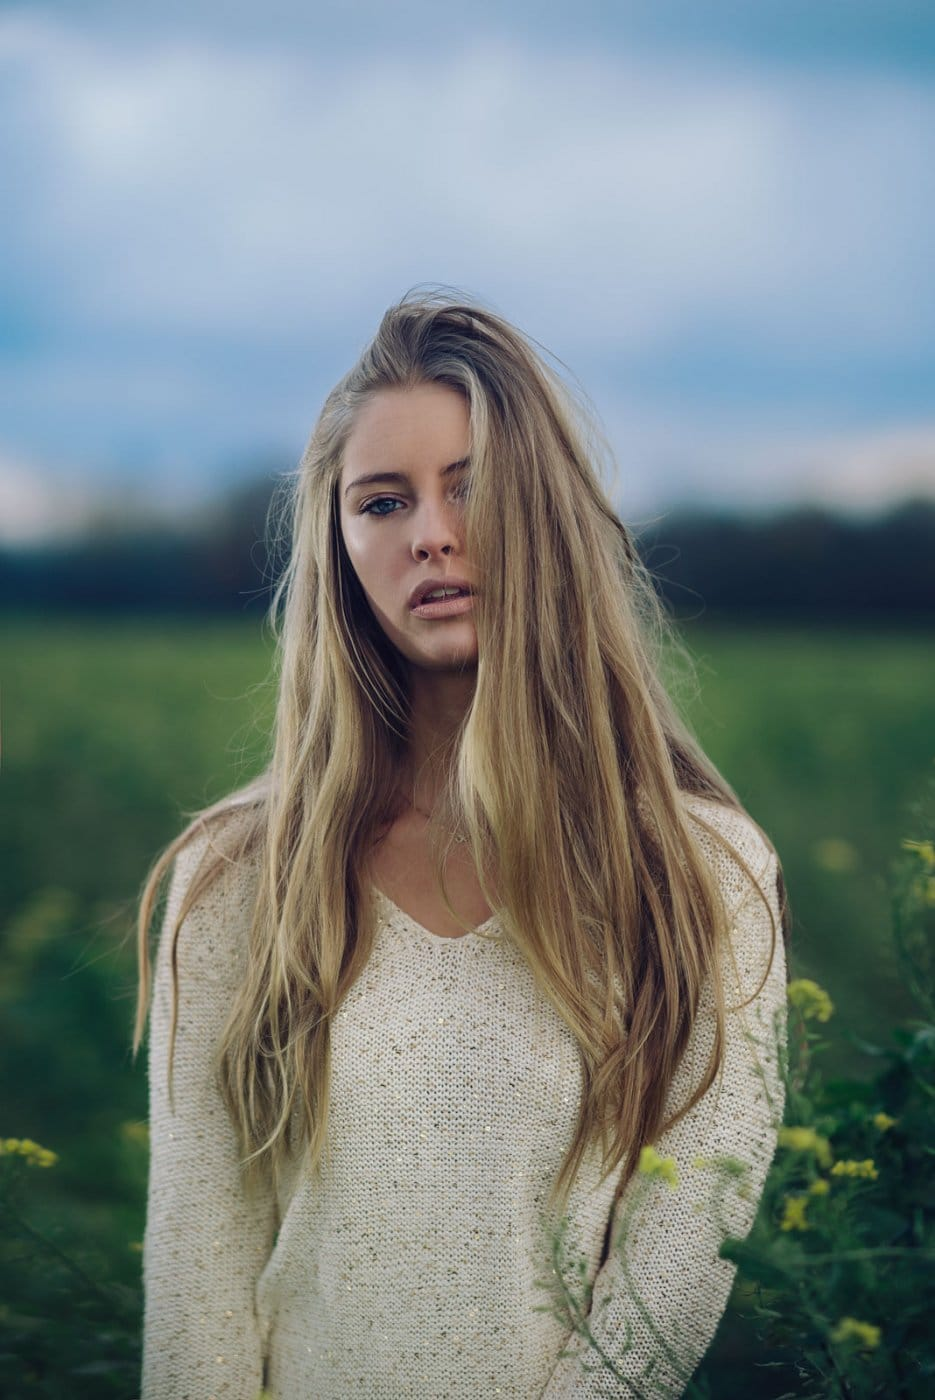 Portrait Photography By Anastasia Vervueren From Camille Rochette